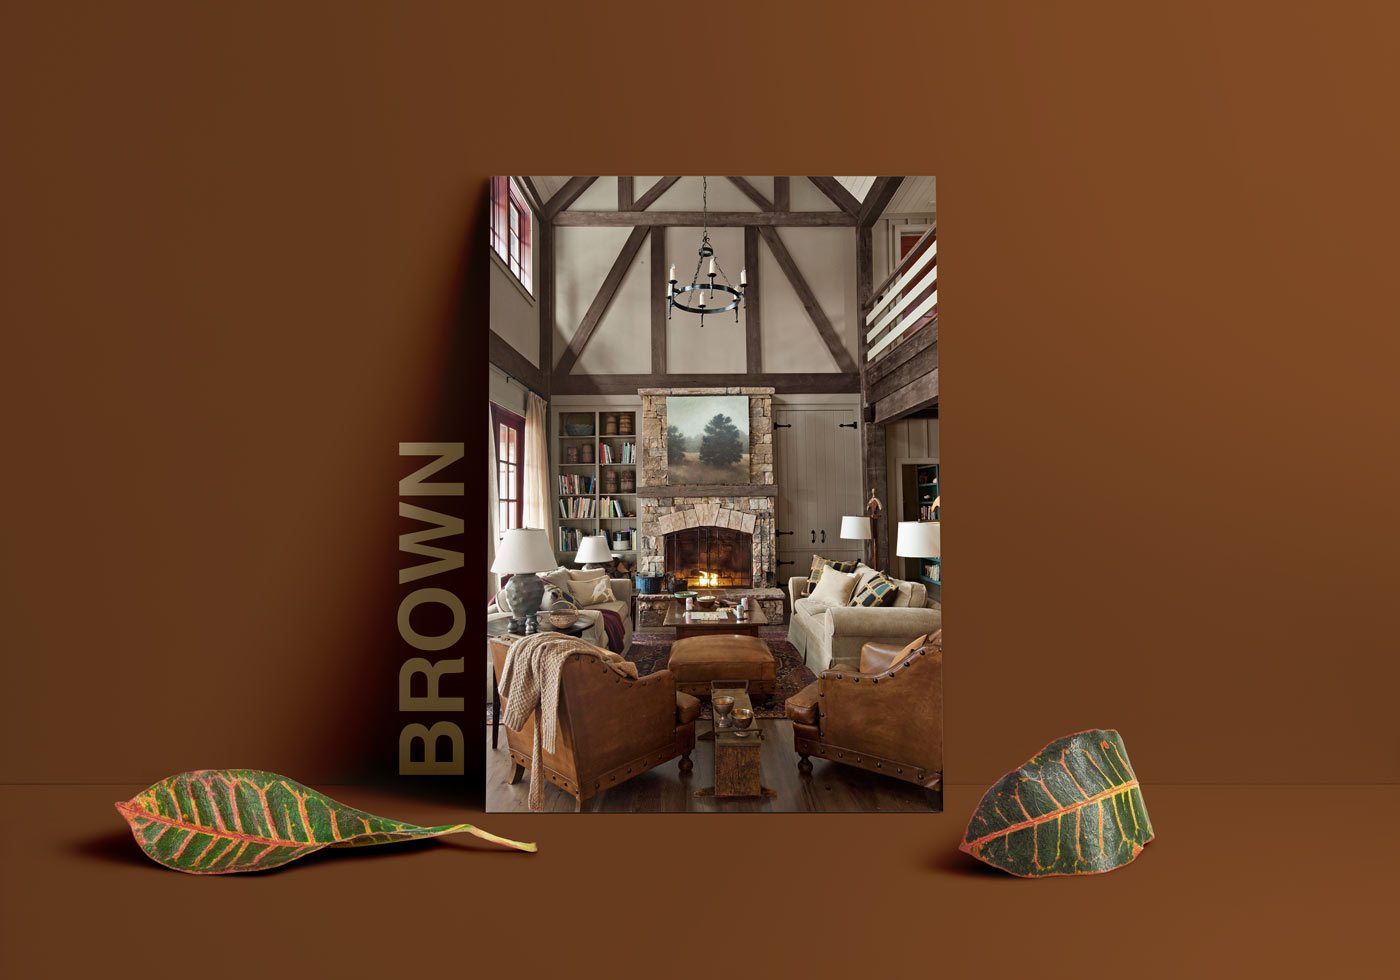 brown interior design - طبع یا مزاج رنگ ها در دکوراسیون داخلی